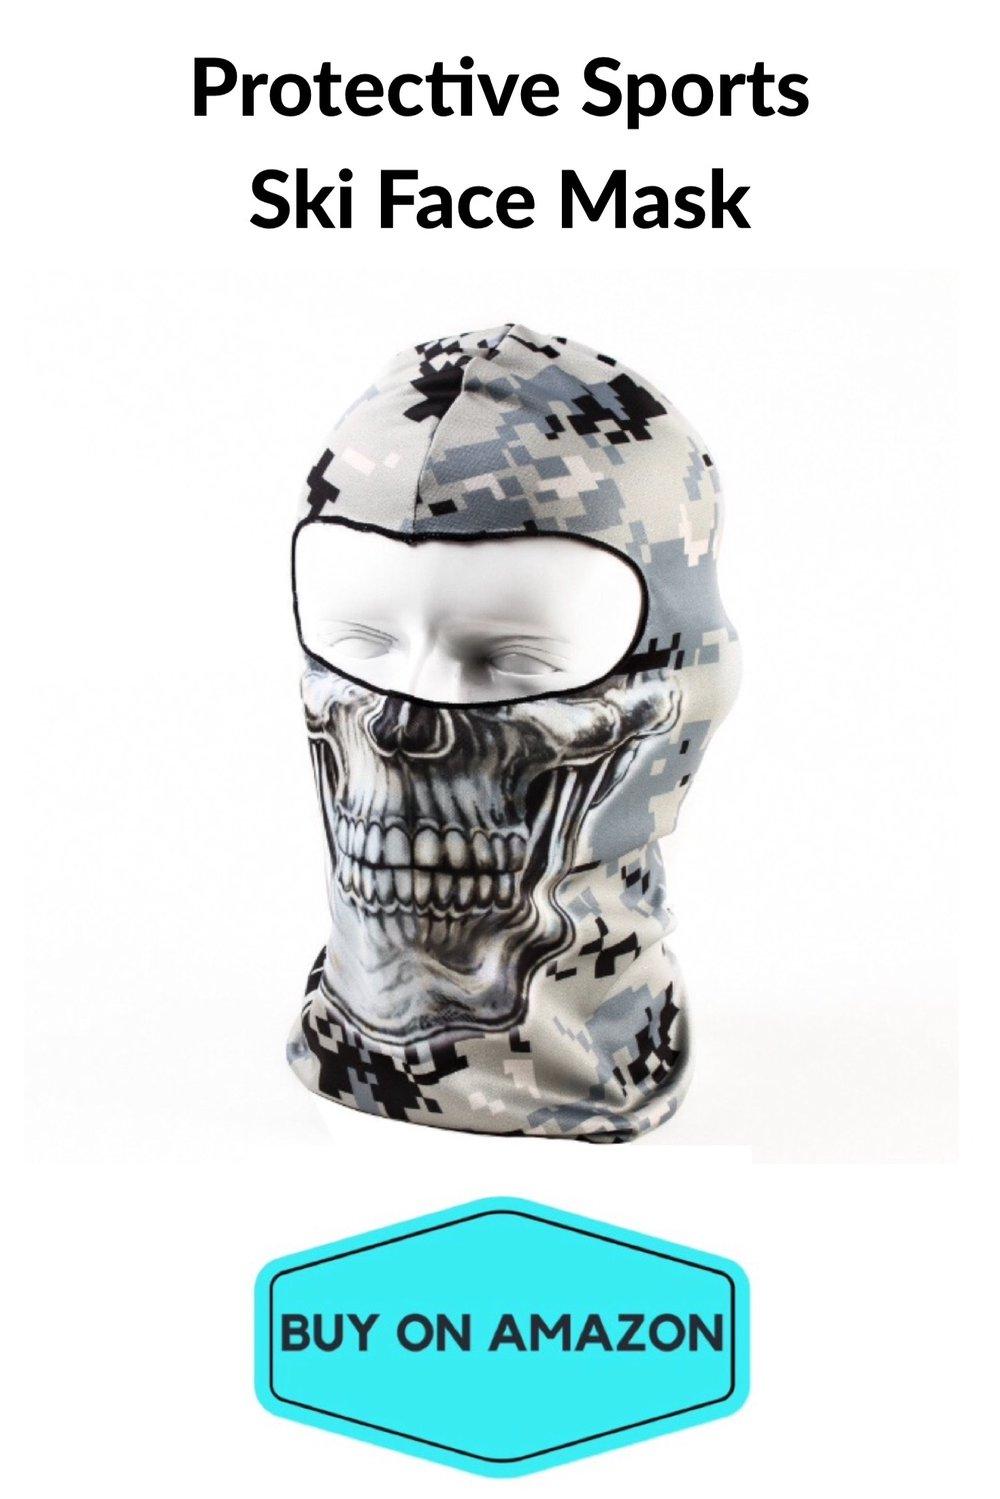 Protective Sports Ski Face Mask